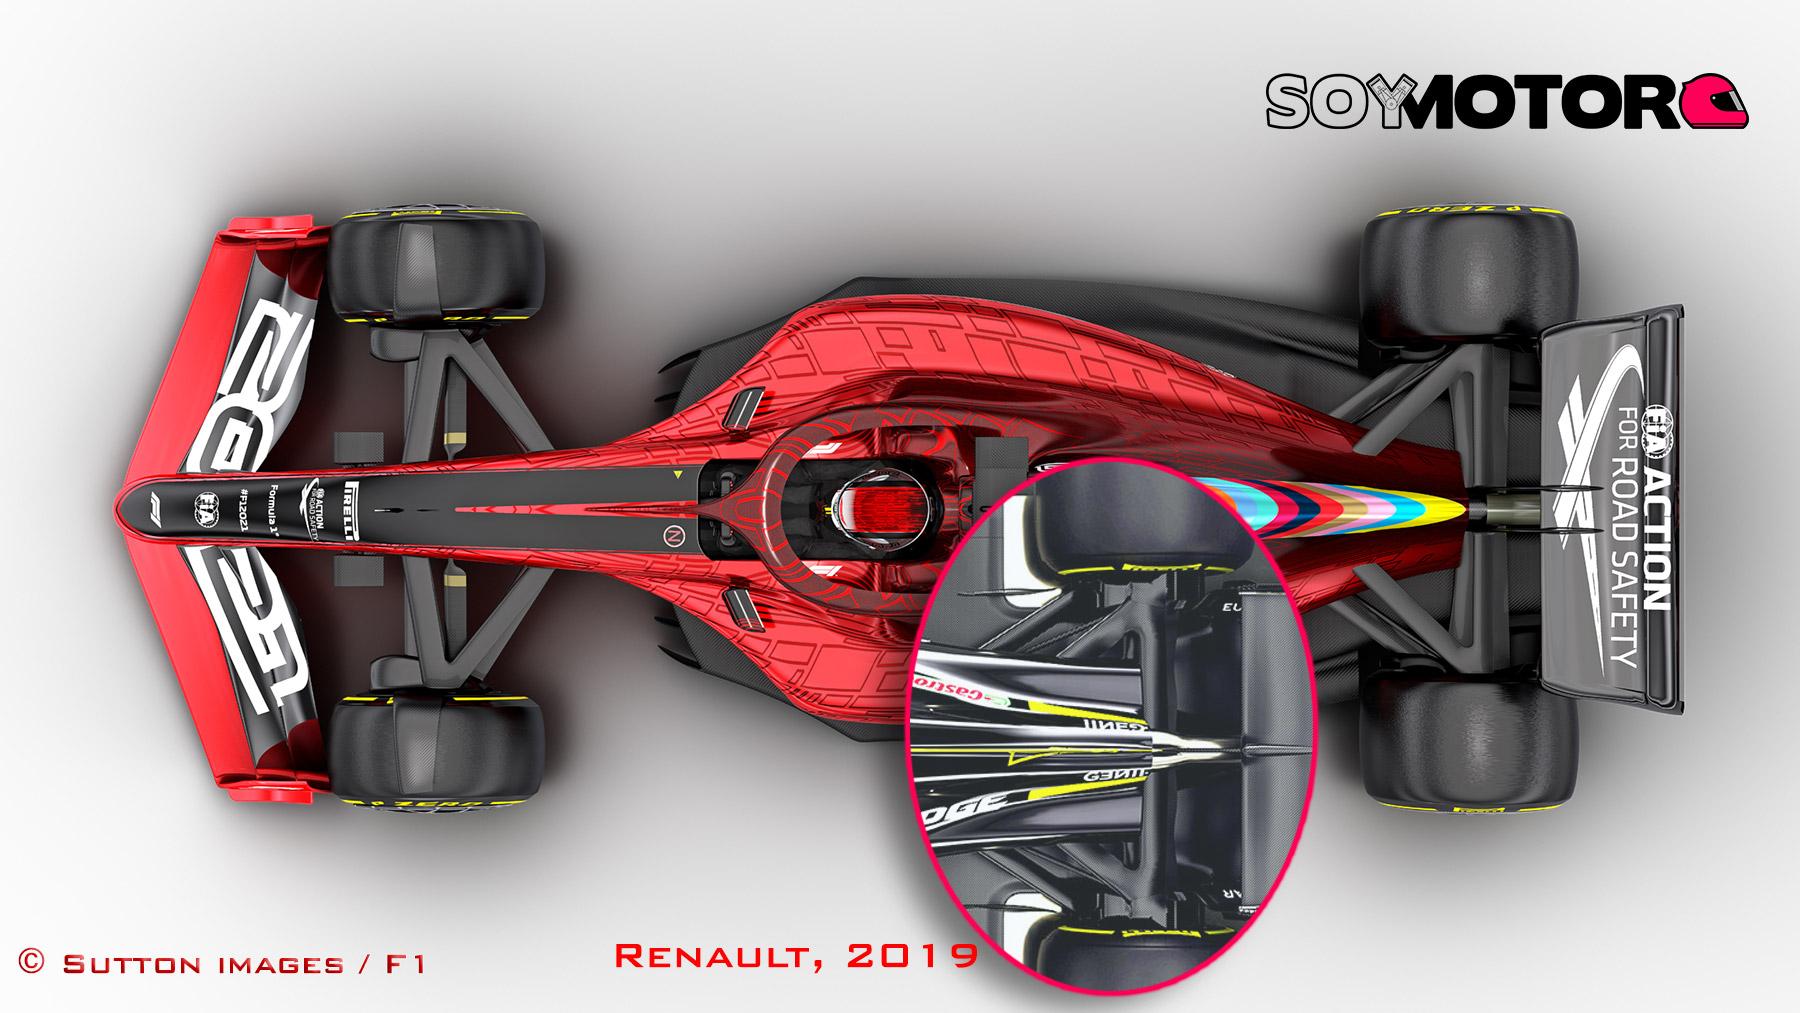 suspension-trasera-2021-soymotor.jpg